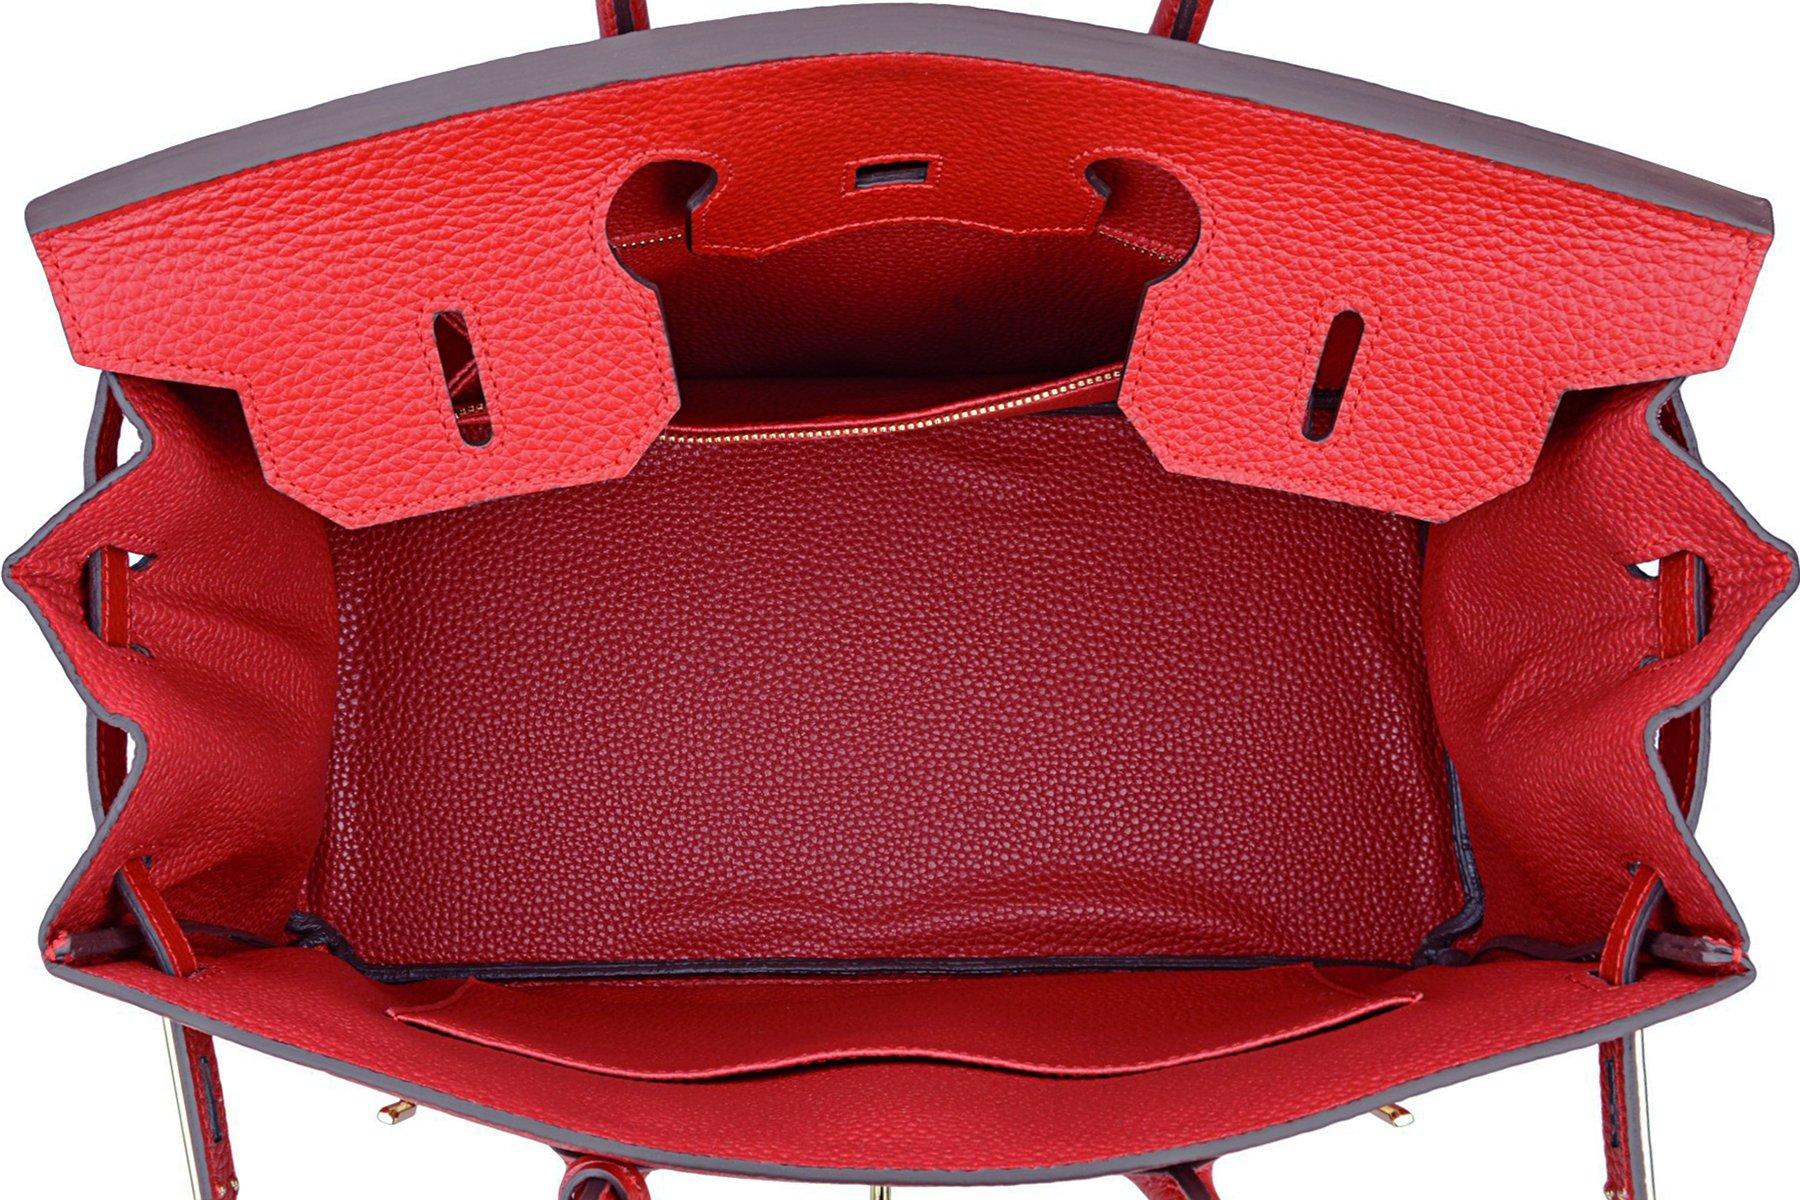 SanMario Designer Handbag Top Handle Padlock Women's Leather Bag with Golden Hardware Red 35cm/14'' by SanMario (Image #6)